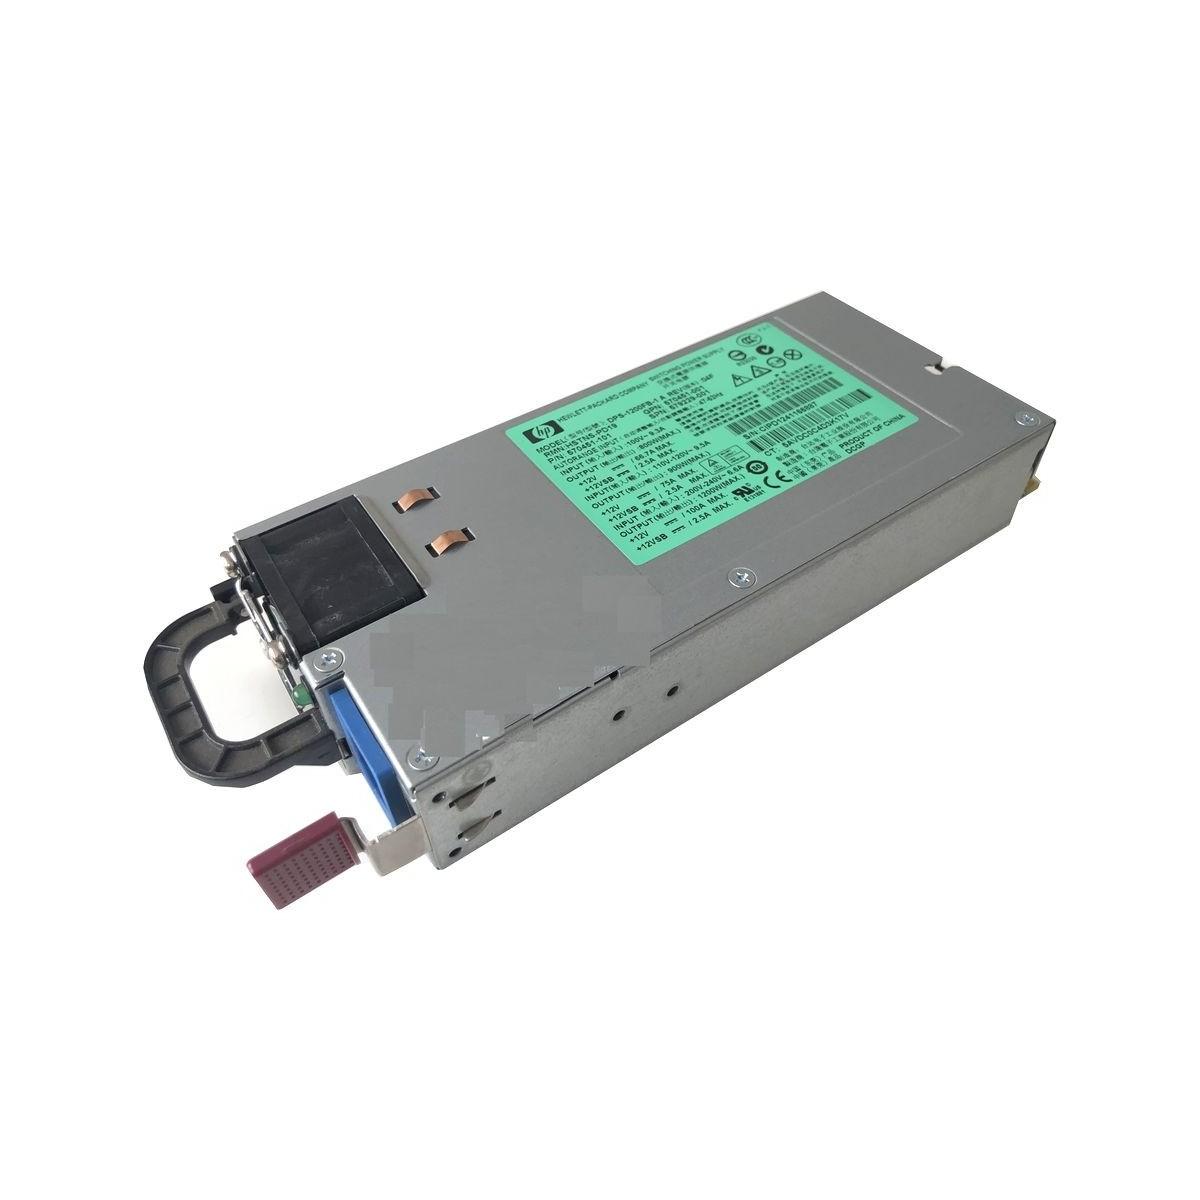 MONITOR HP E243 23,8'' IPS LED HDMI FULL HD USB 3.0